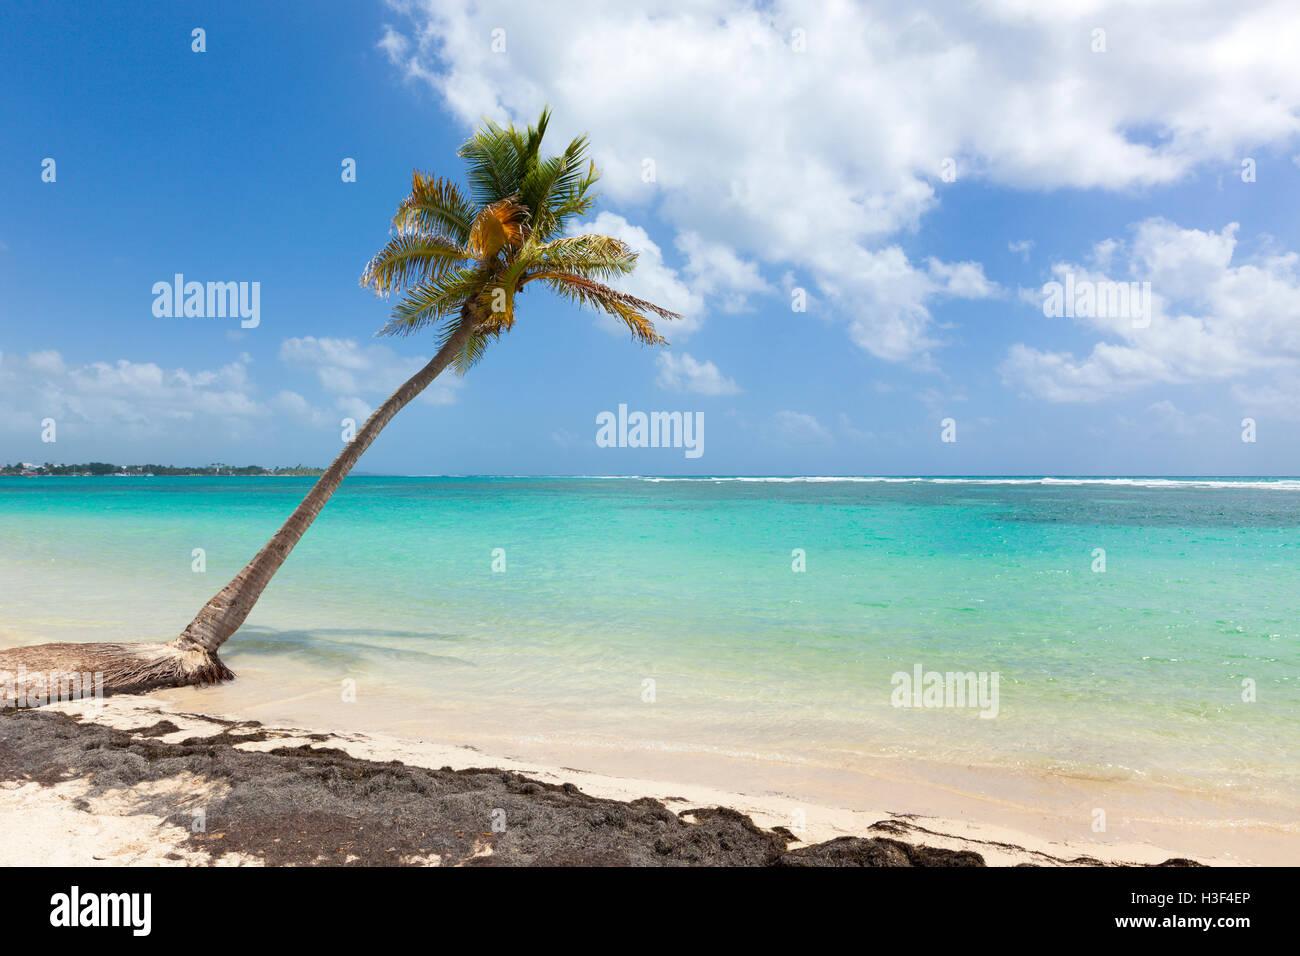 Single palm tree at Caribbean Sea beach, Guadeloupe Stock Photo